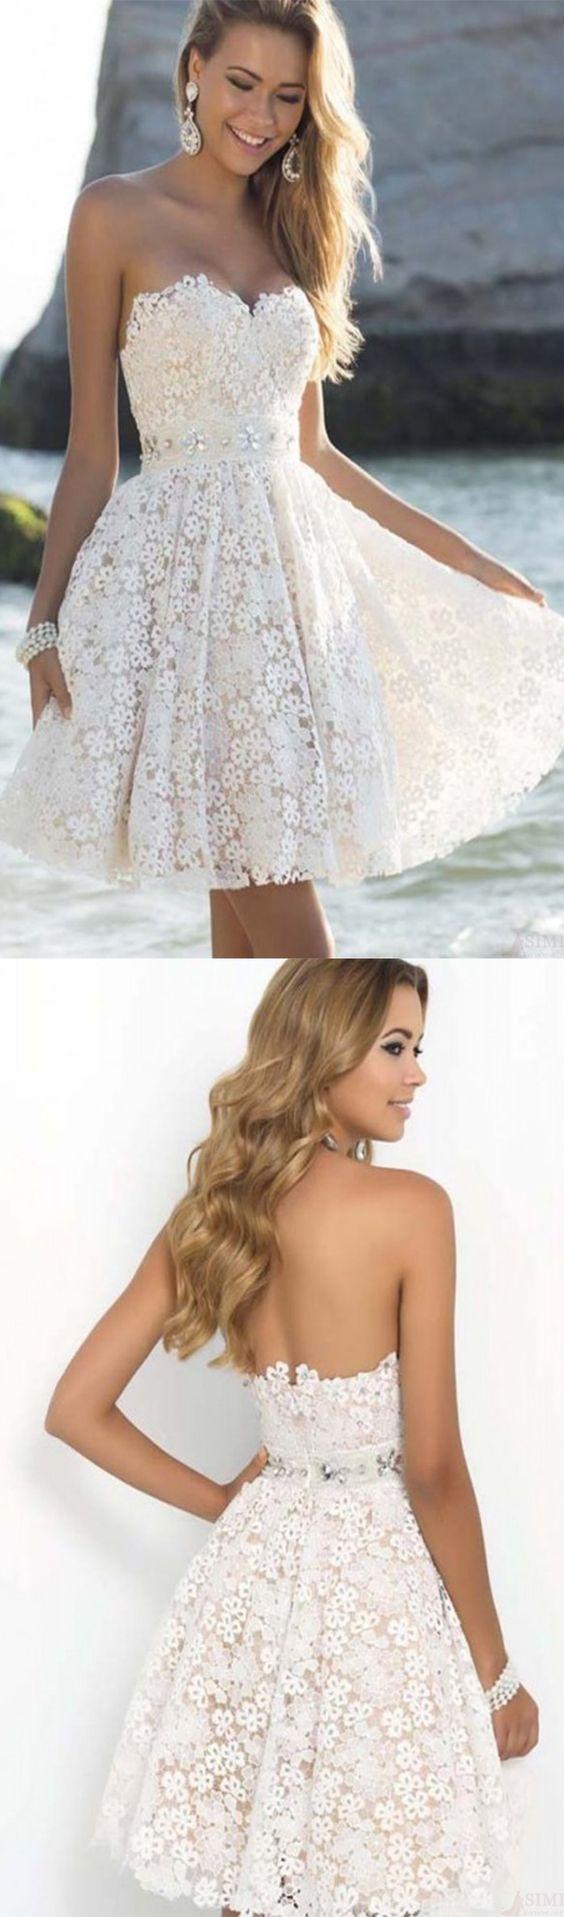 Elegant Sweatheart Knee Length Short White Homecoming Prom Party Dresses